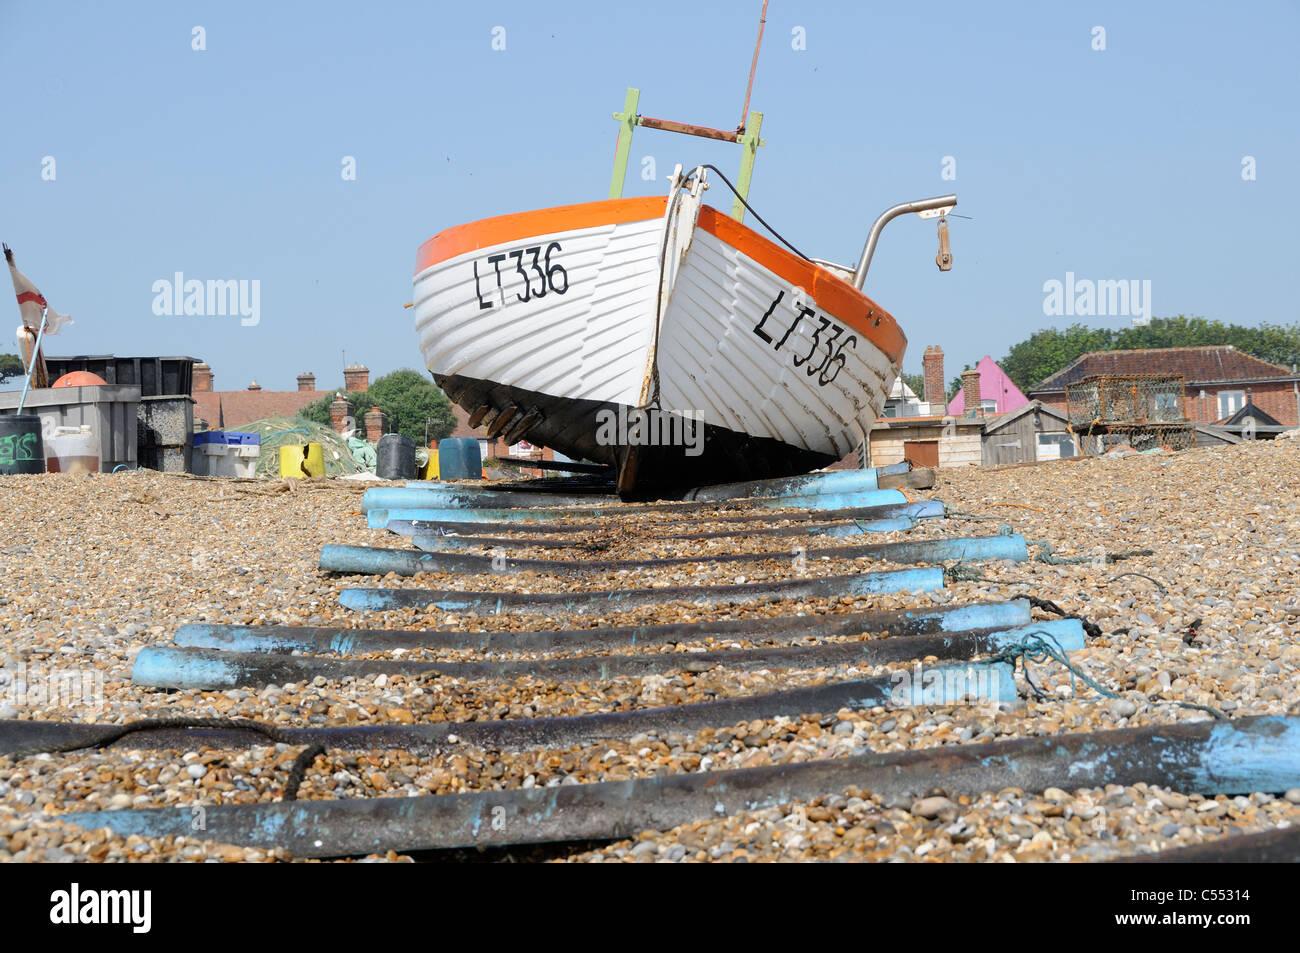 Fishing boat on shingle beach, Aldeburgh, Suffolk, England, July - Stock Image